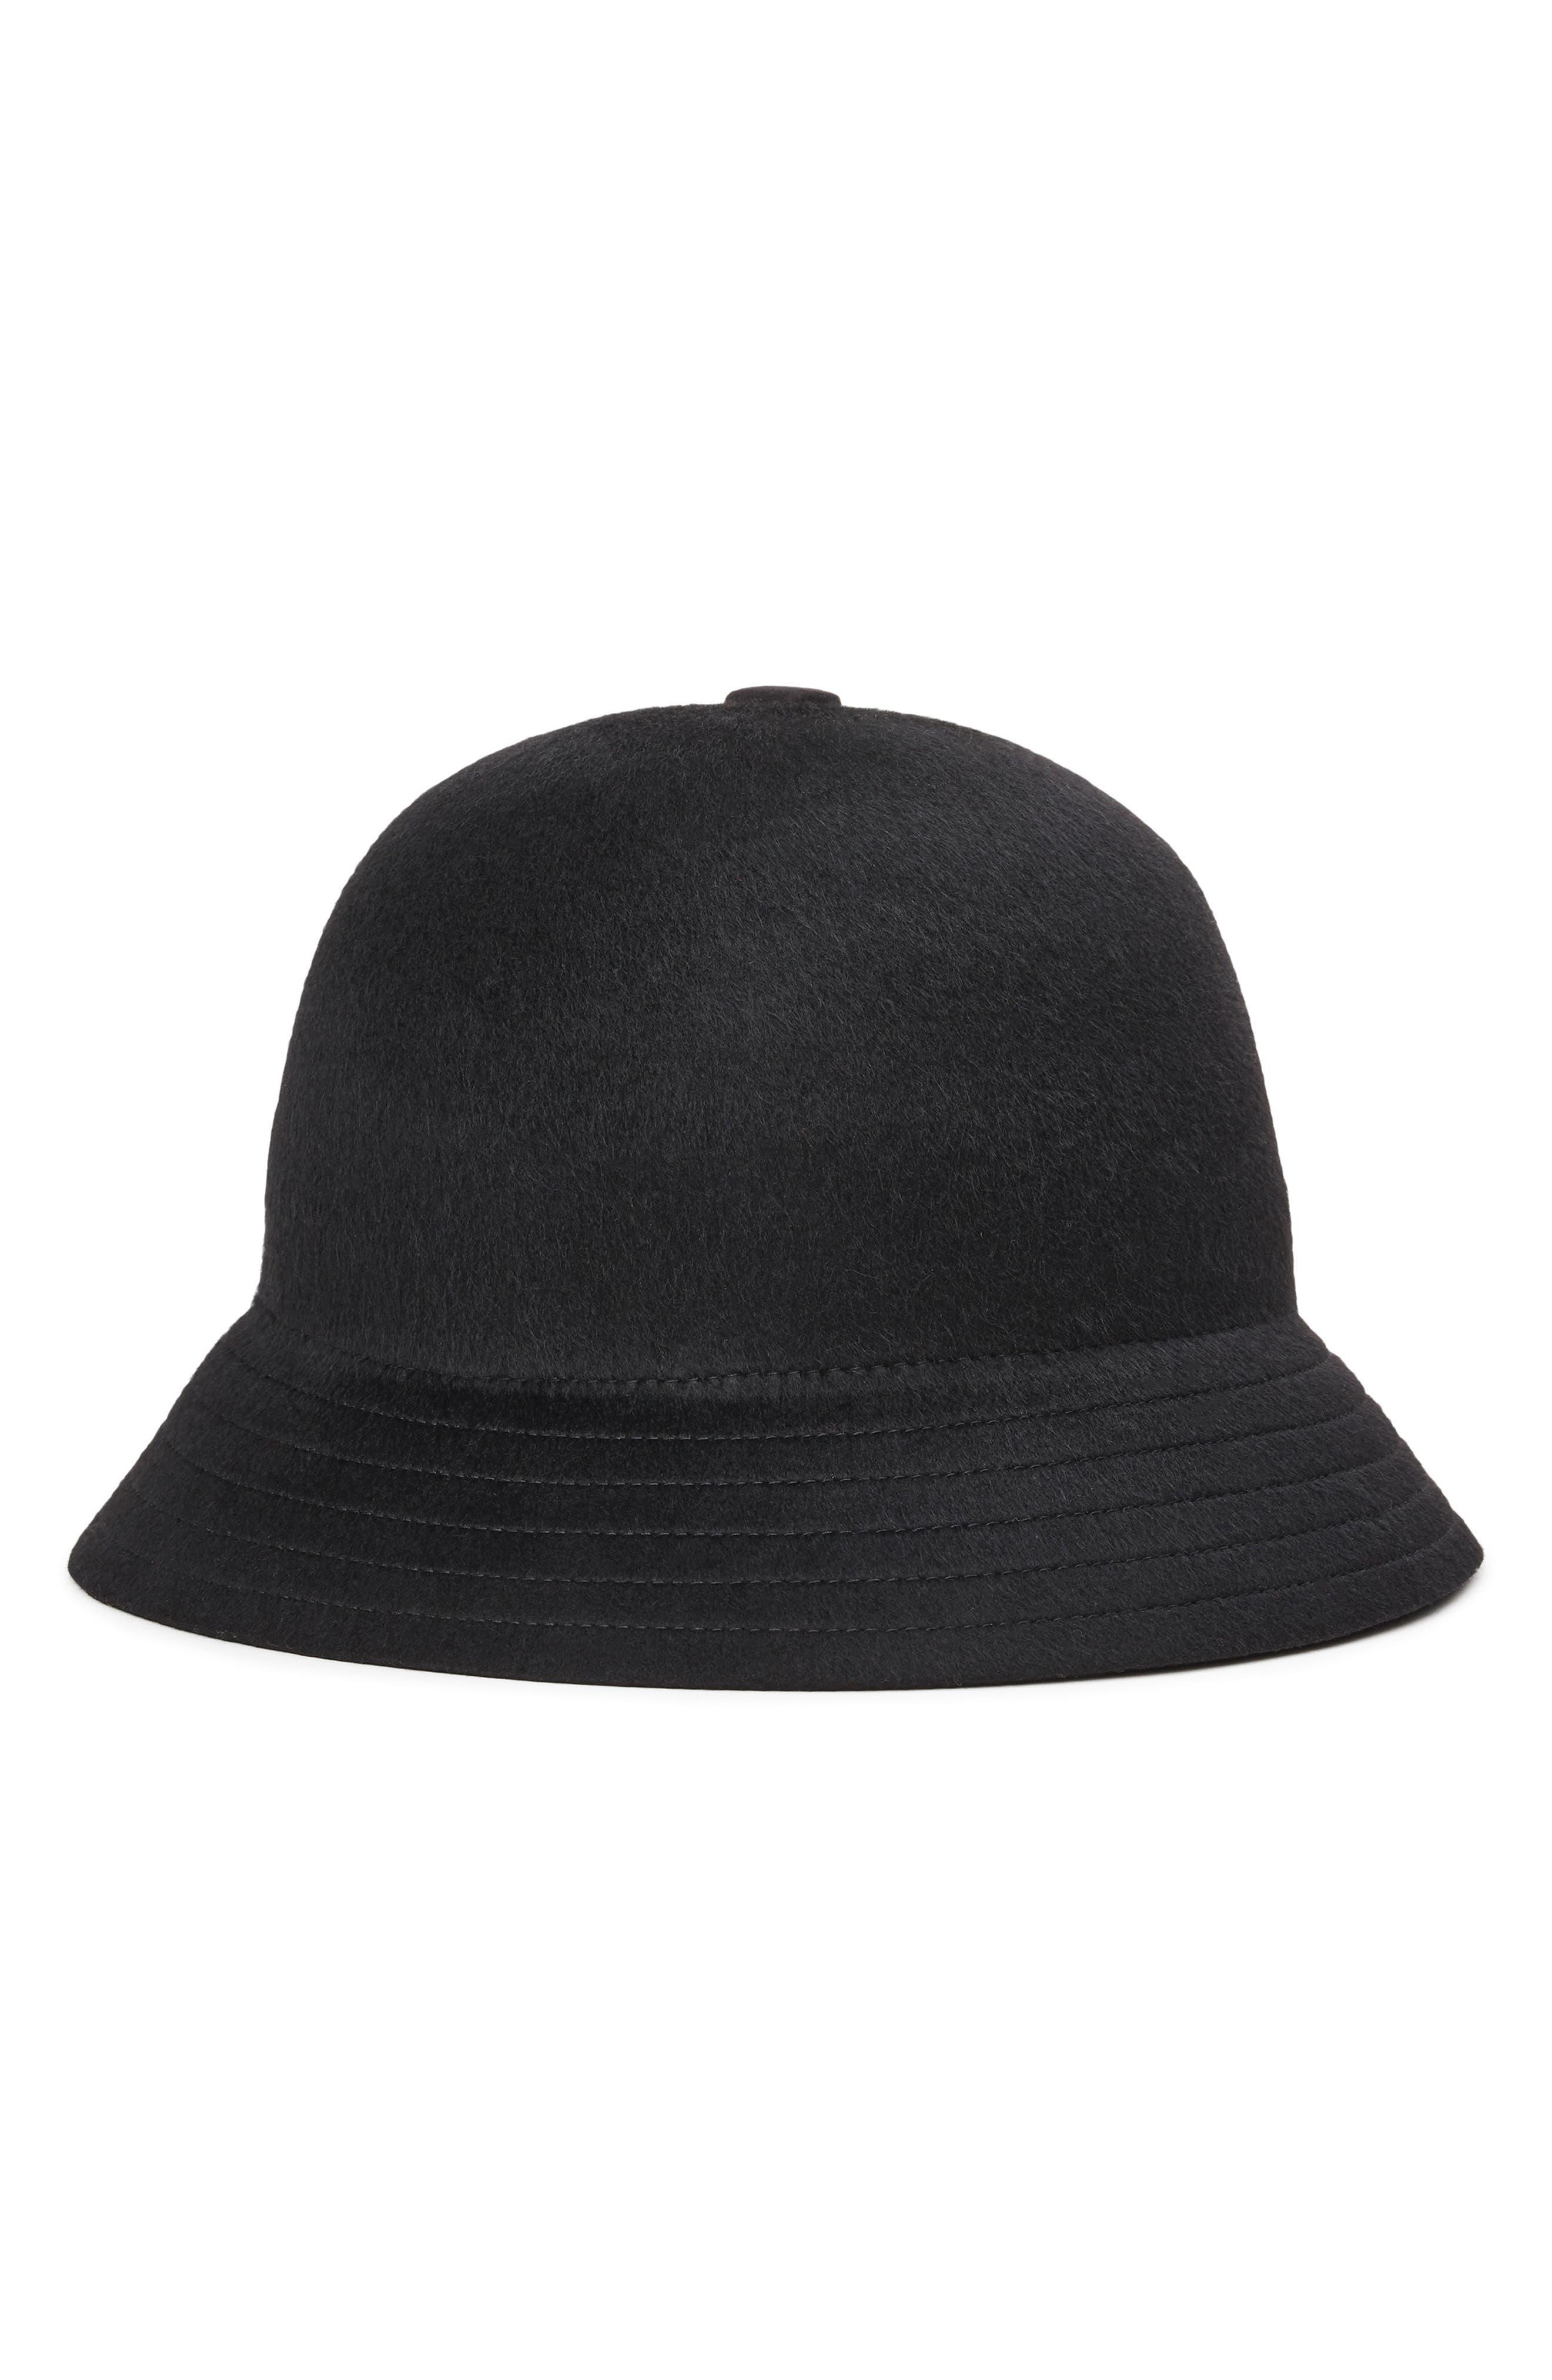 Essex Bucket Hat,                         Main,                         color, 004